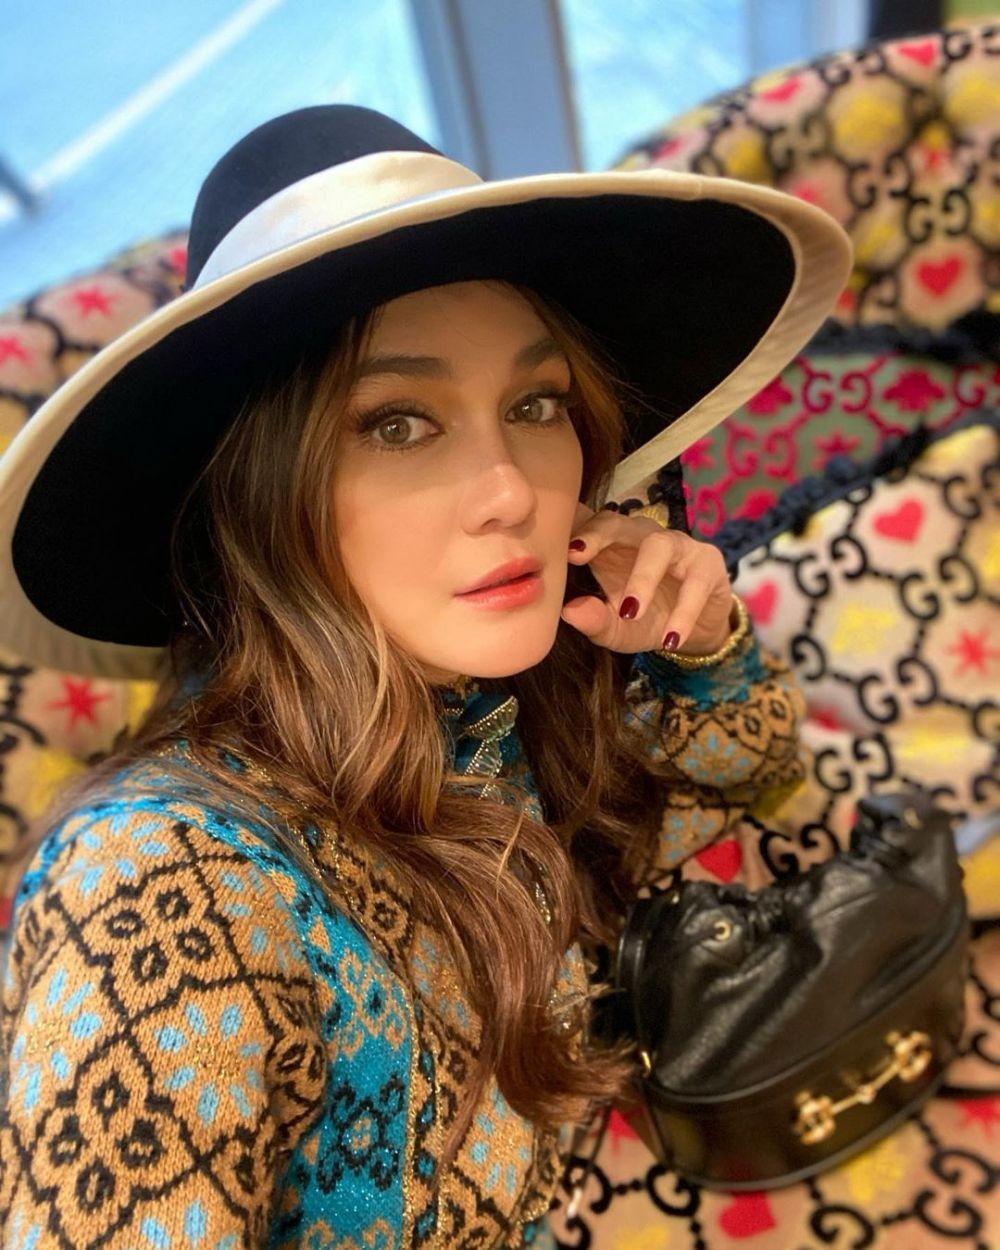 Fashionable Abis, 9 Potret Luna Maya di Acara Gucci Jepang